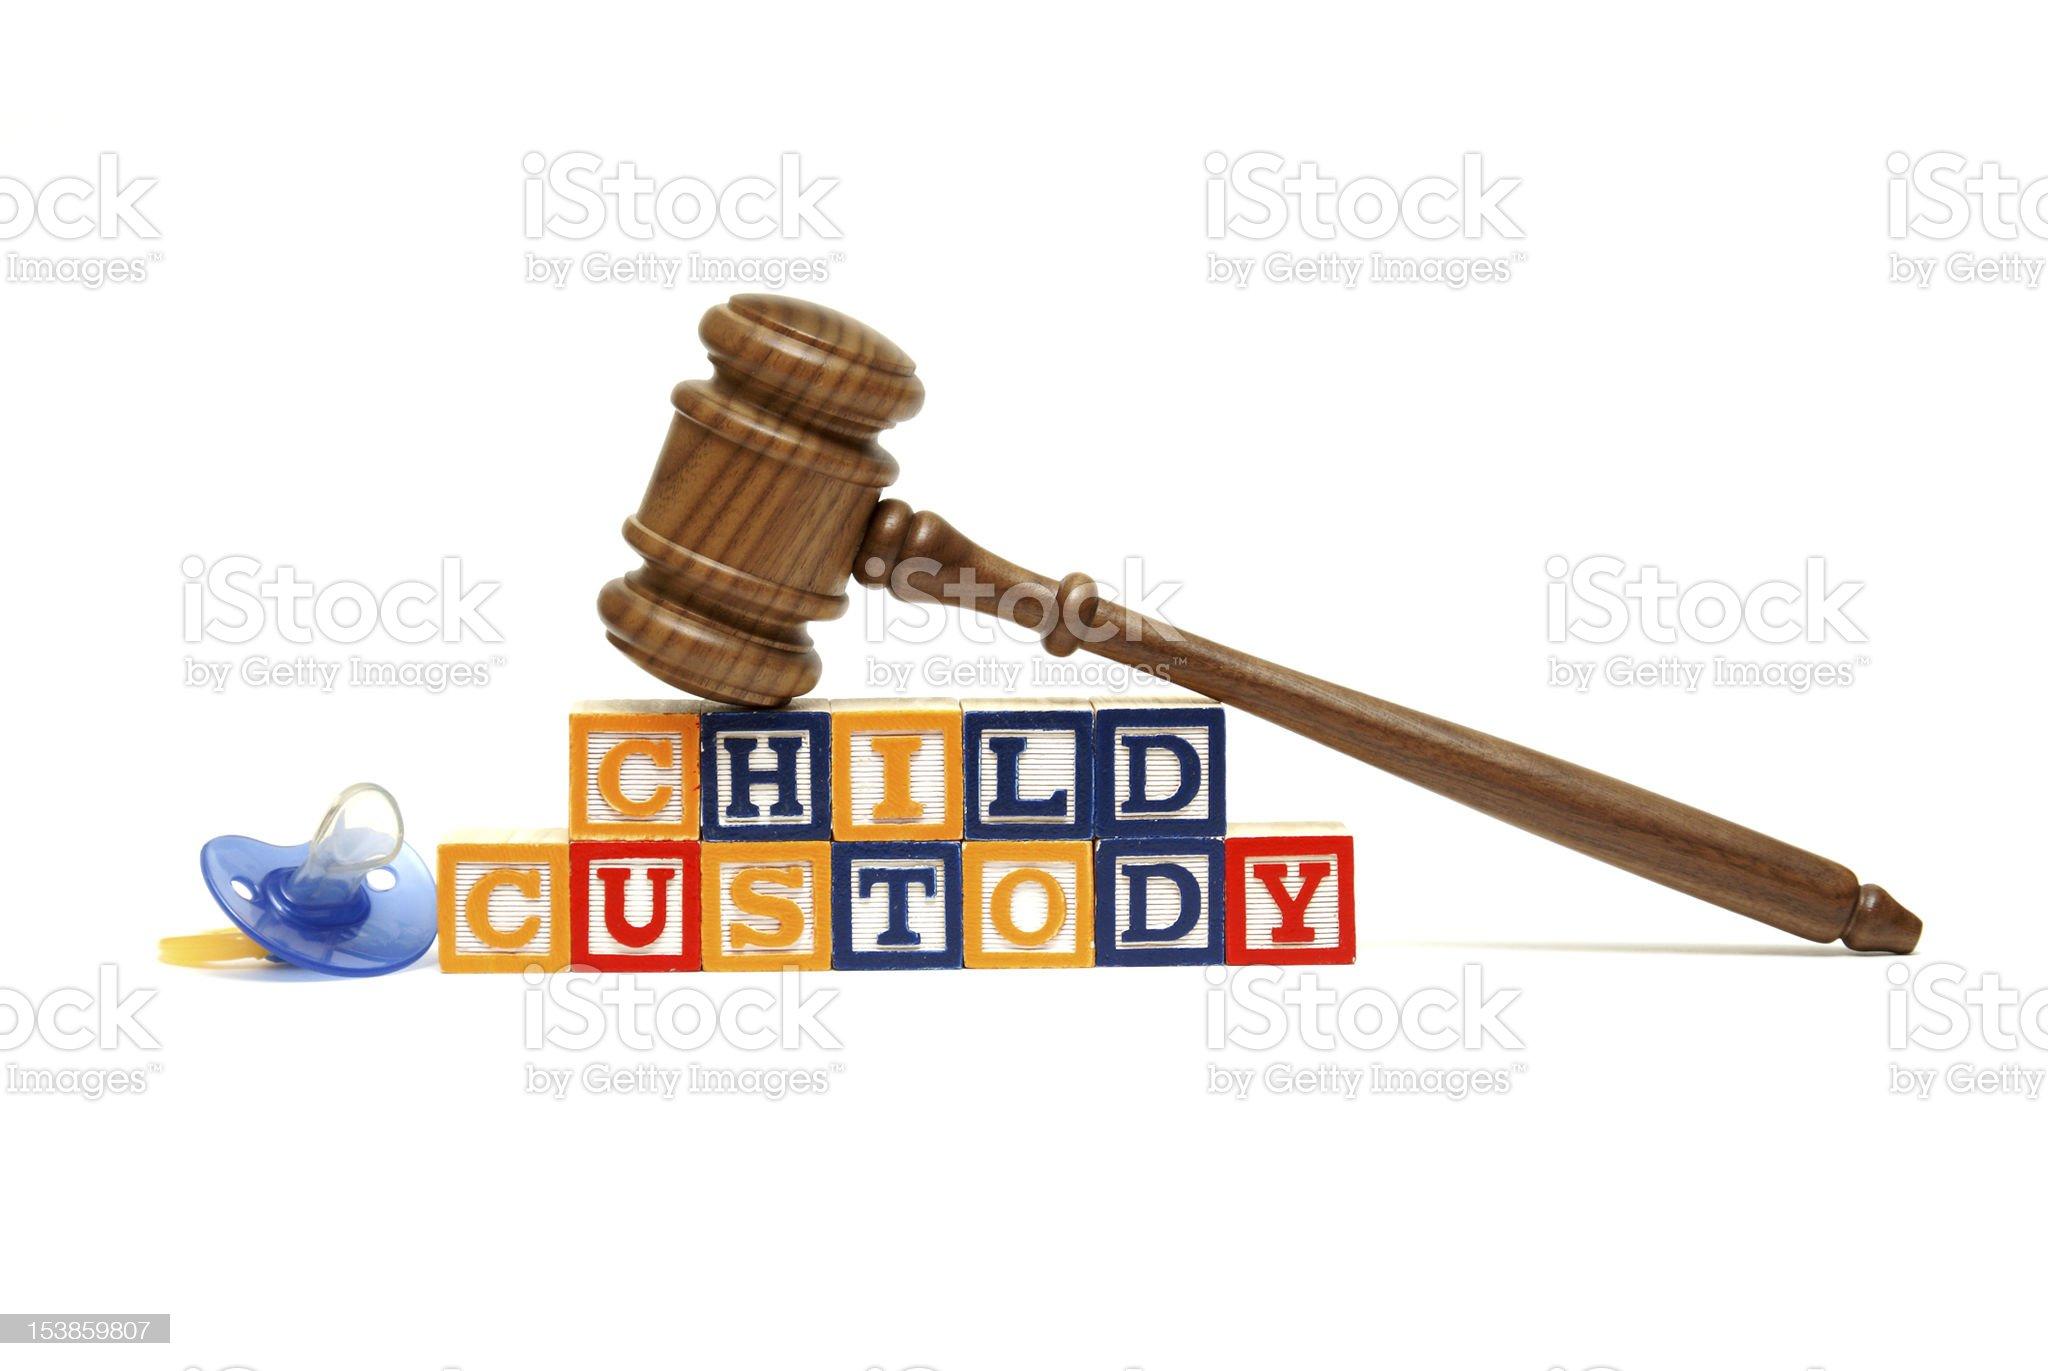 Image of judge's gavel on blocks spelling Child Custody royalty-free stock photo